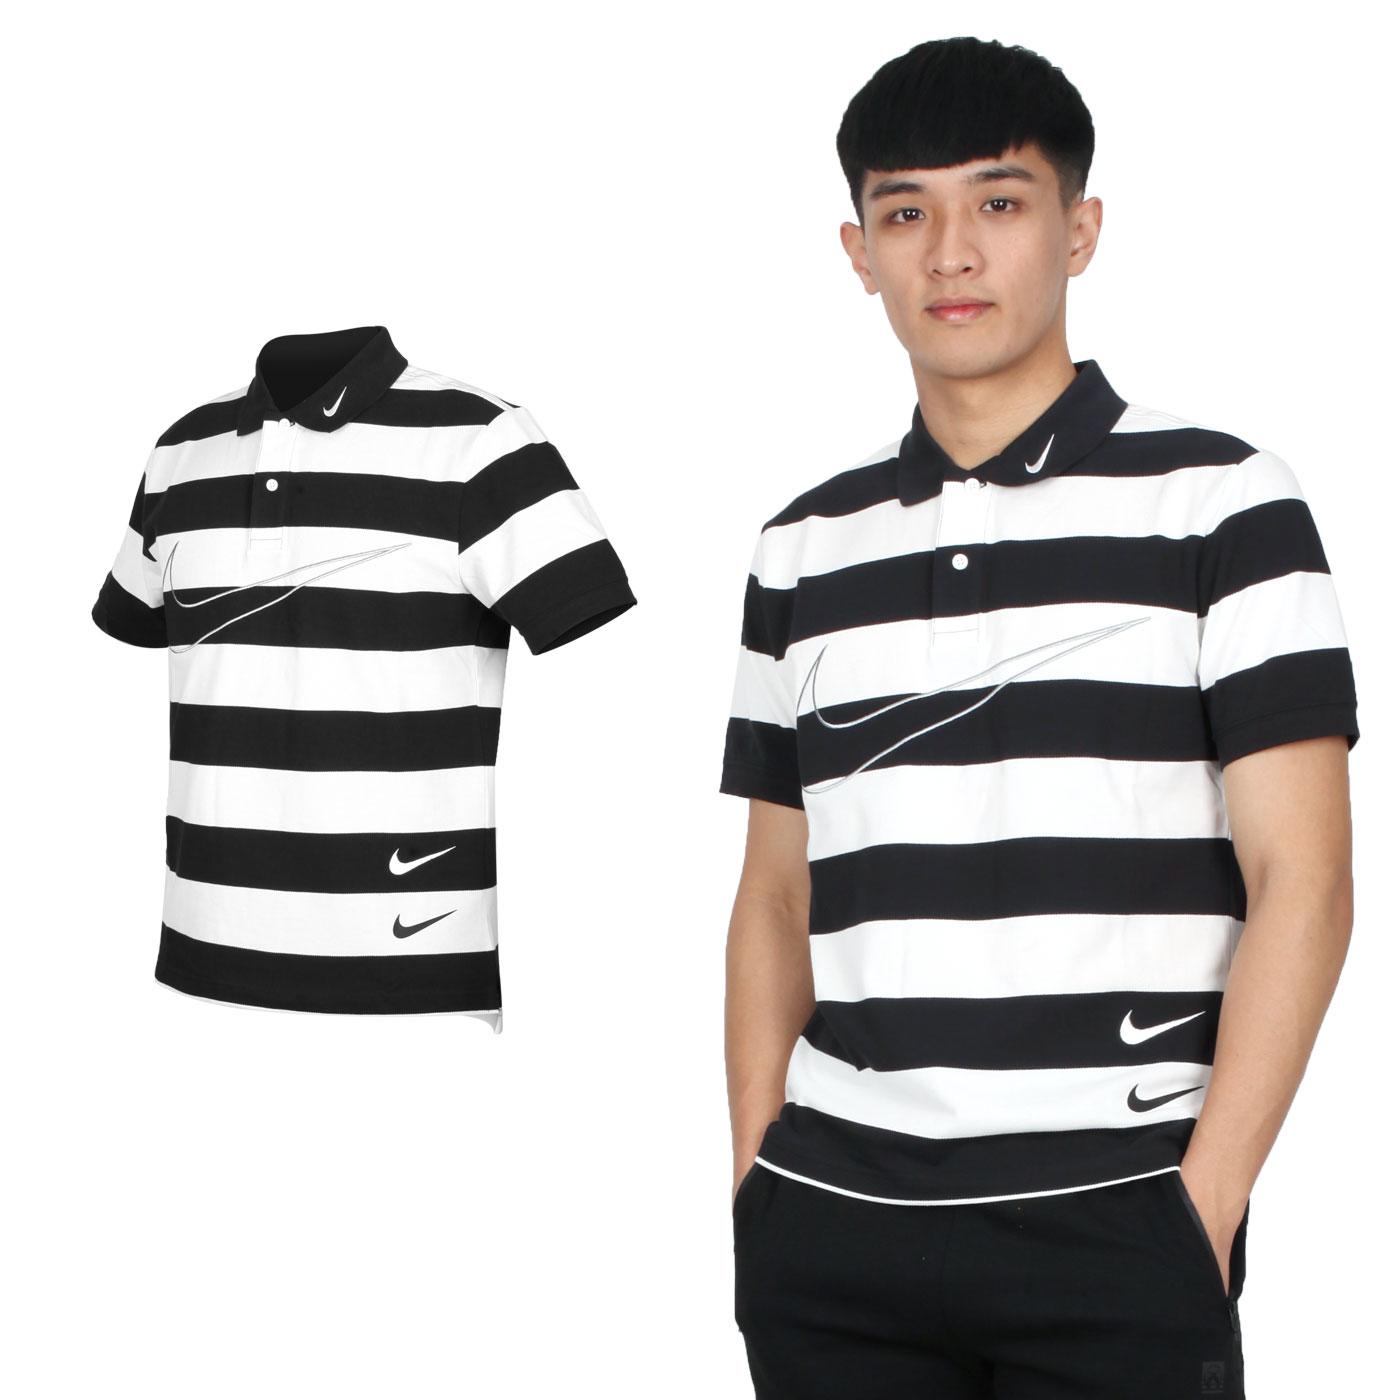 NIKE 男款短袖POLO衫 CJ4910-011 - 黑白灰